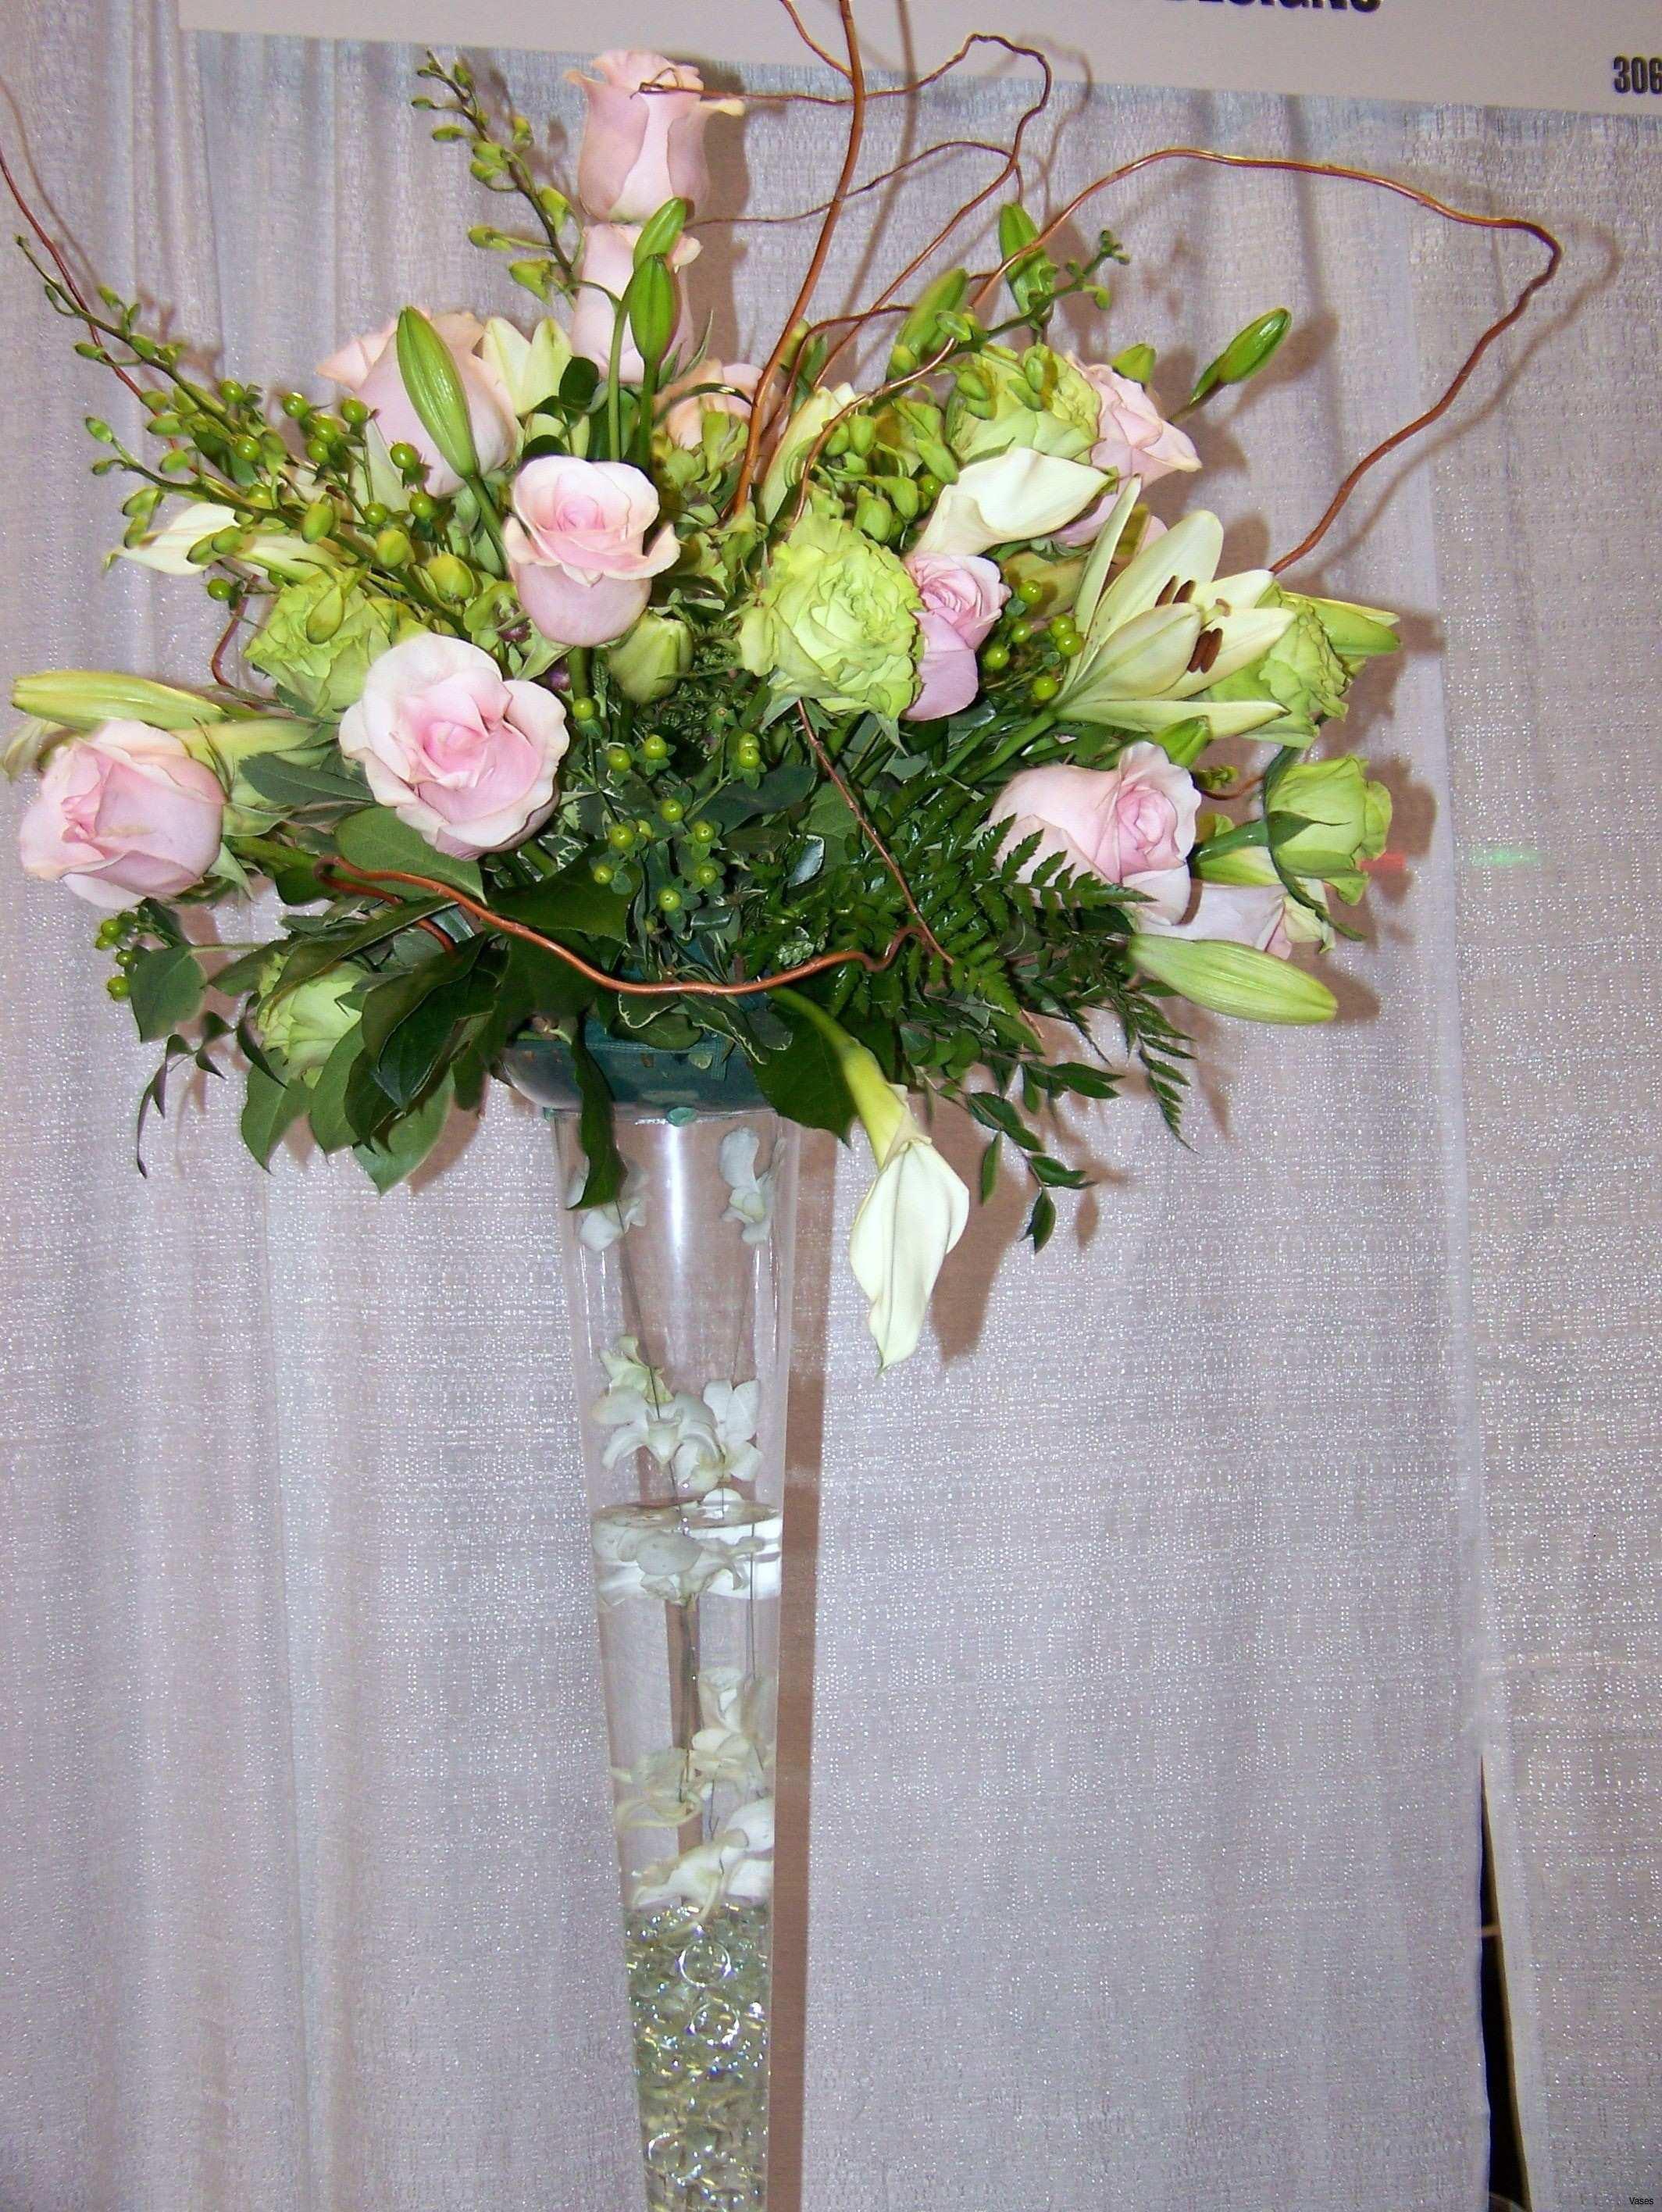 20 eiffel tower vases wholesale of luxury flower ideas garden ideas for cheap flower vase ideas new h vases ideas for floral arrangements in i 0d design ideas